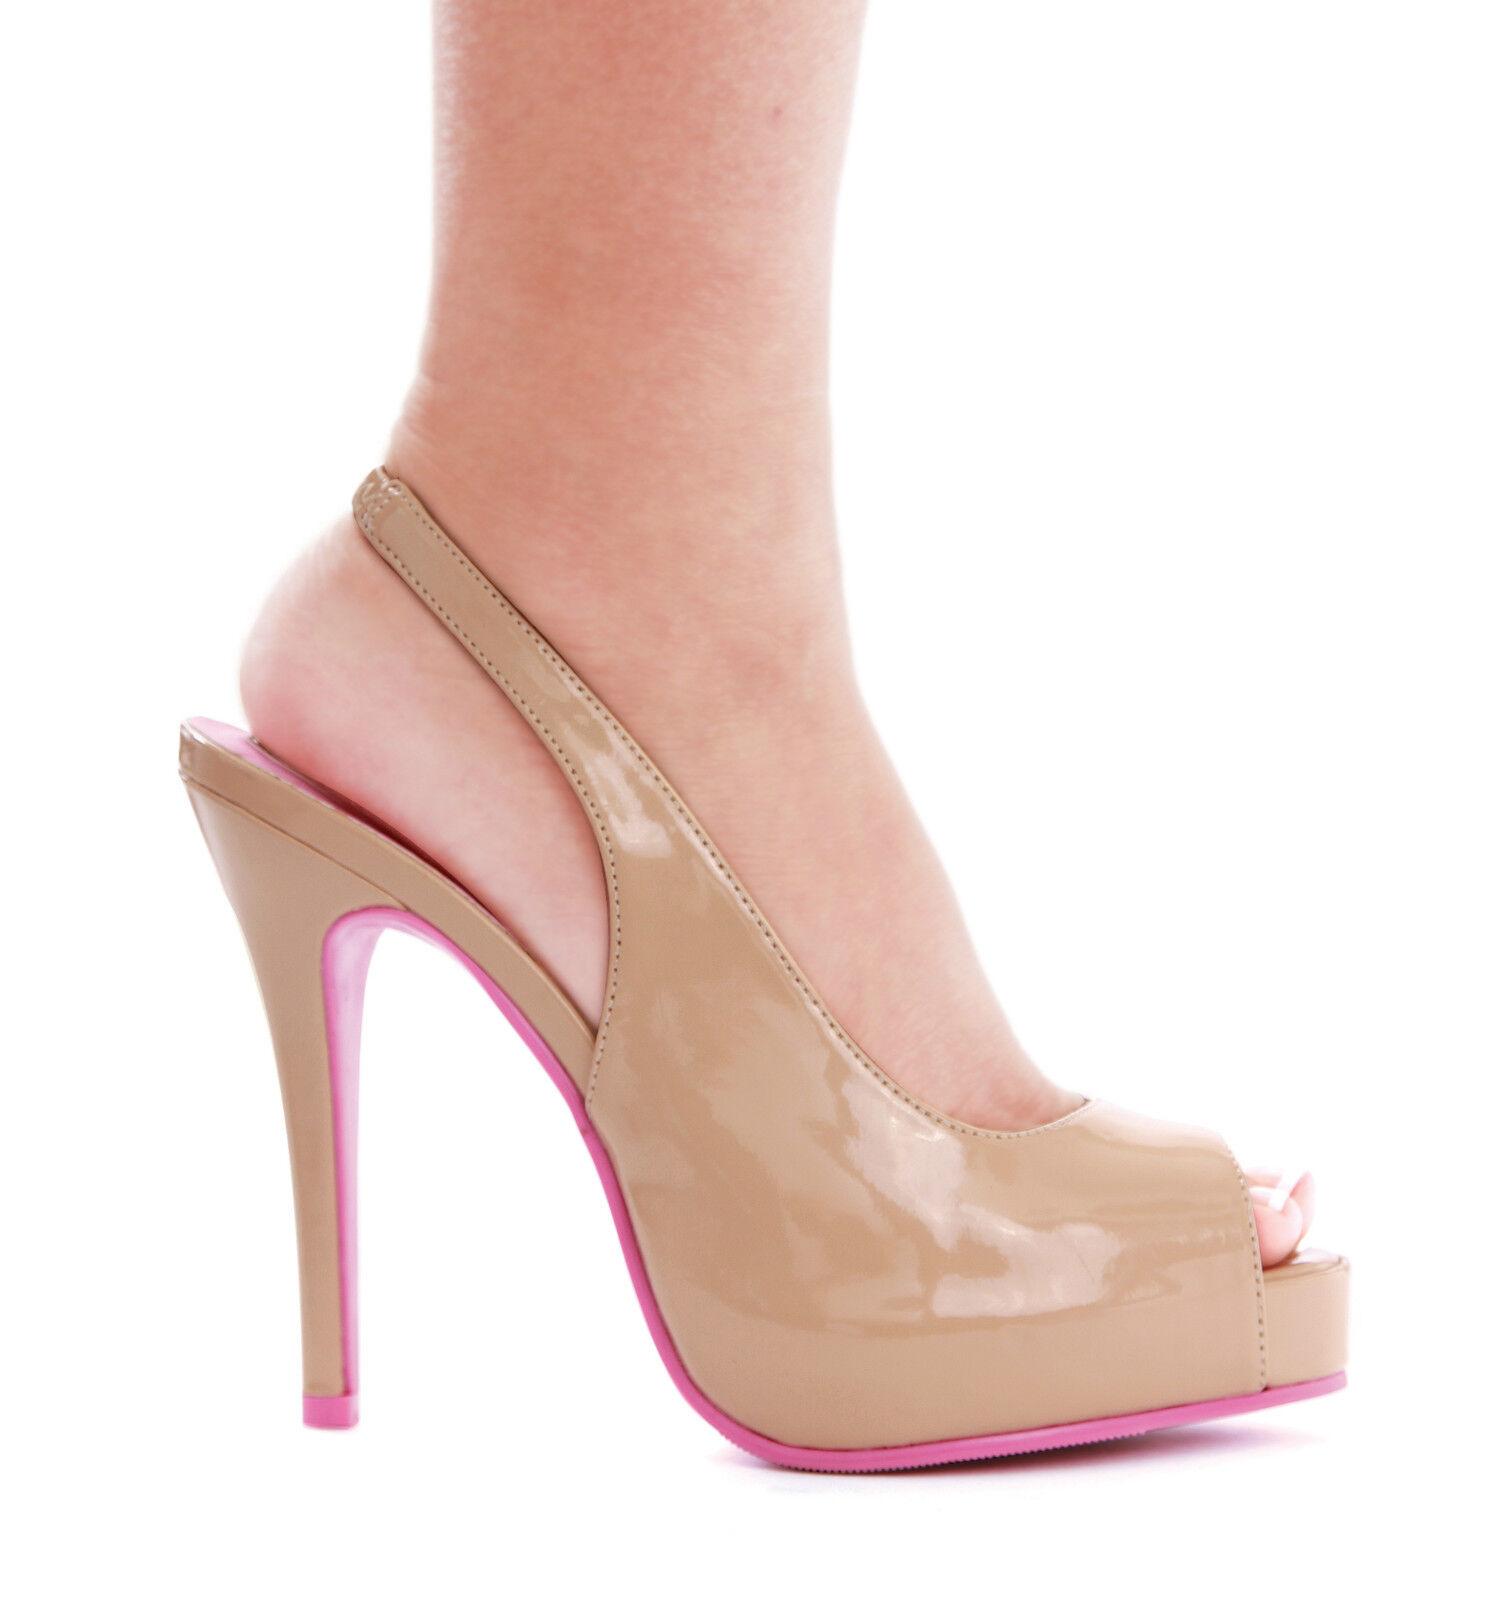 Ellie 451-MaryEllen open platform open 451-MaryEllen toe slingback 4 inch high heel nude pumps shoe 4dda78